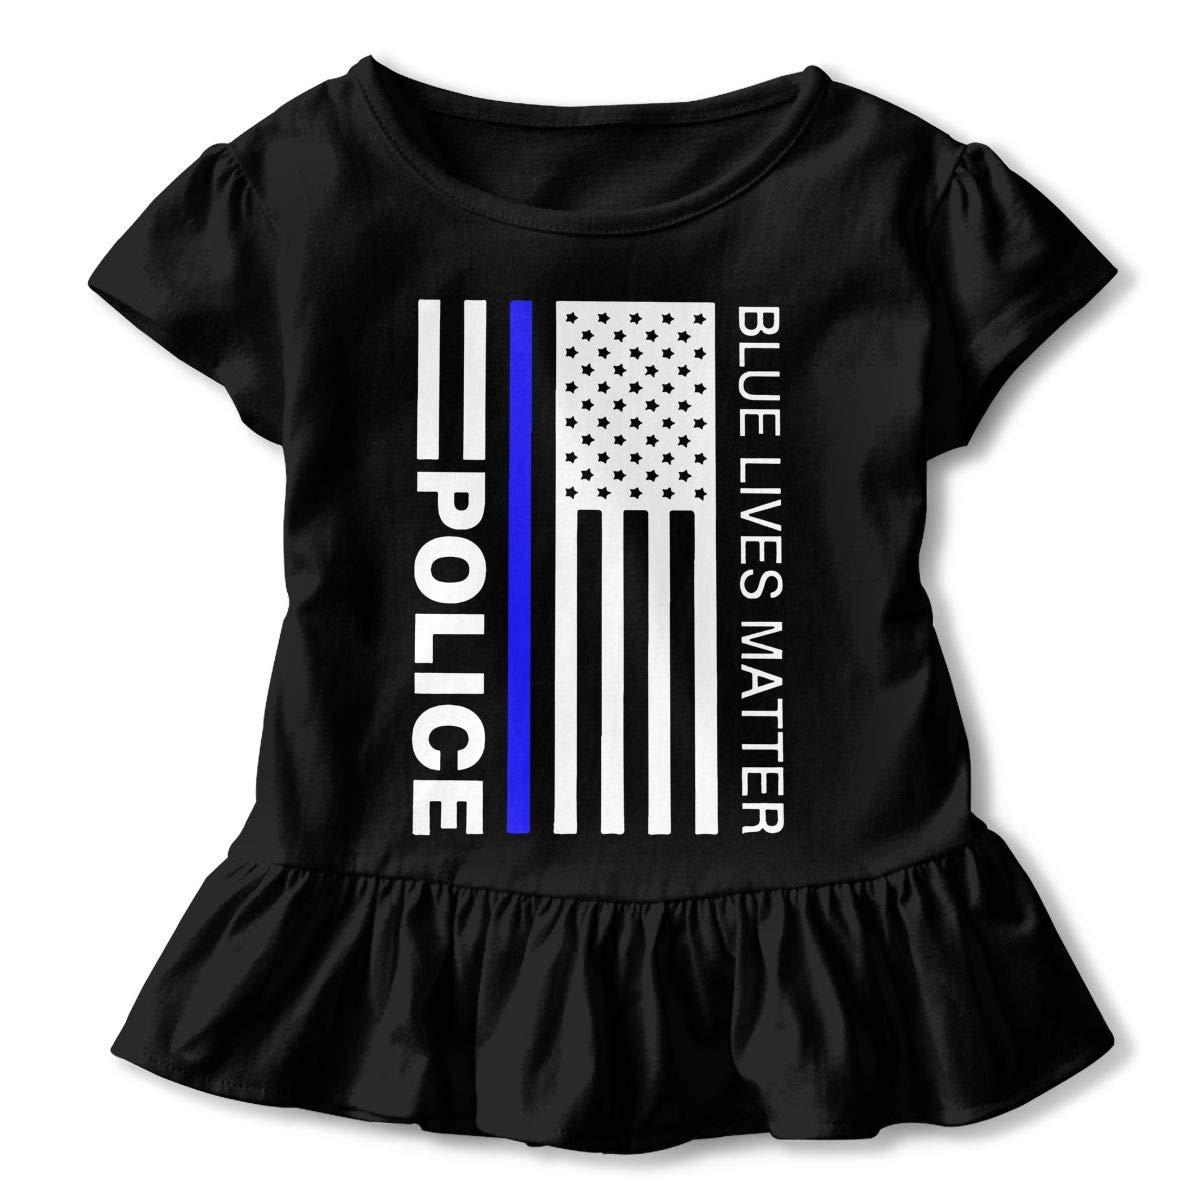 Blue Lives Matter Police Toddler//Infant Girls Short Sleeve Ruffles Shirt T-Shirt for 2-6 Toddlers